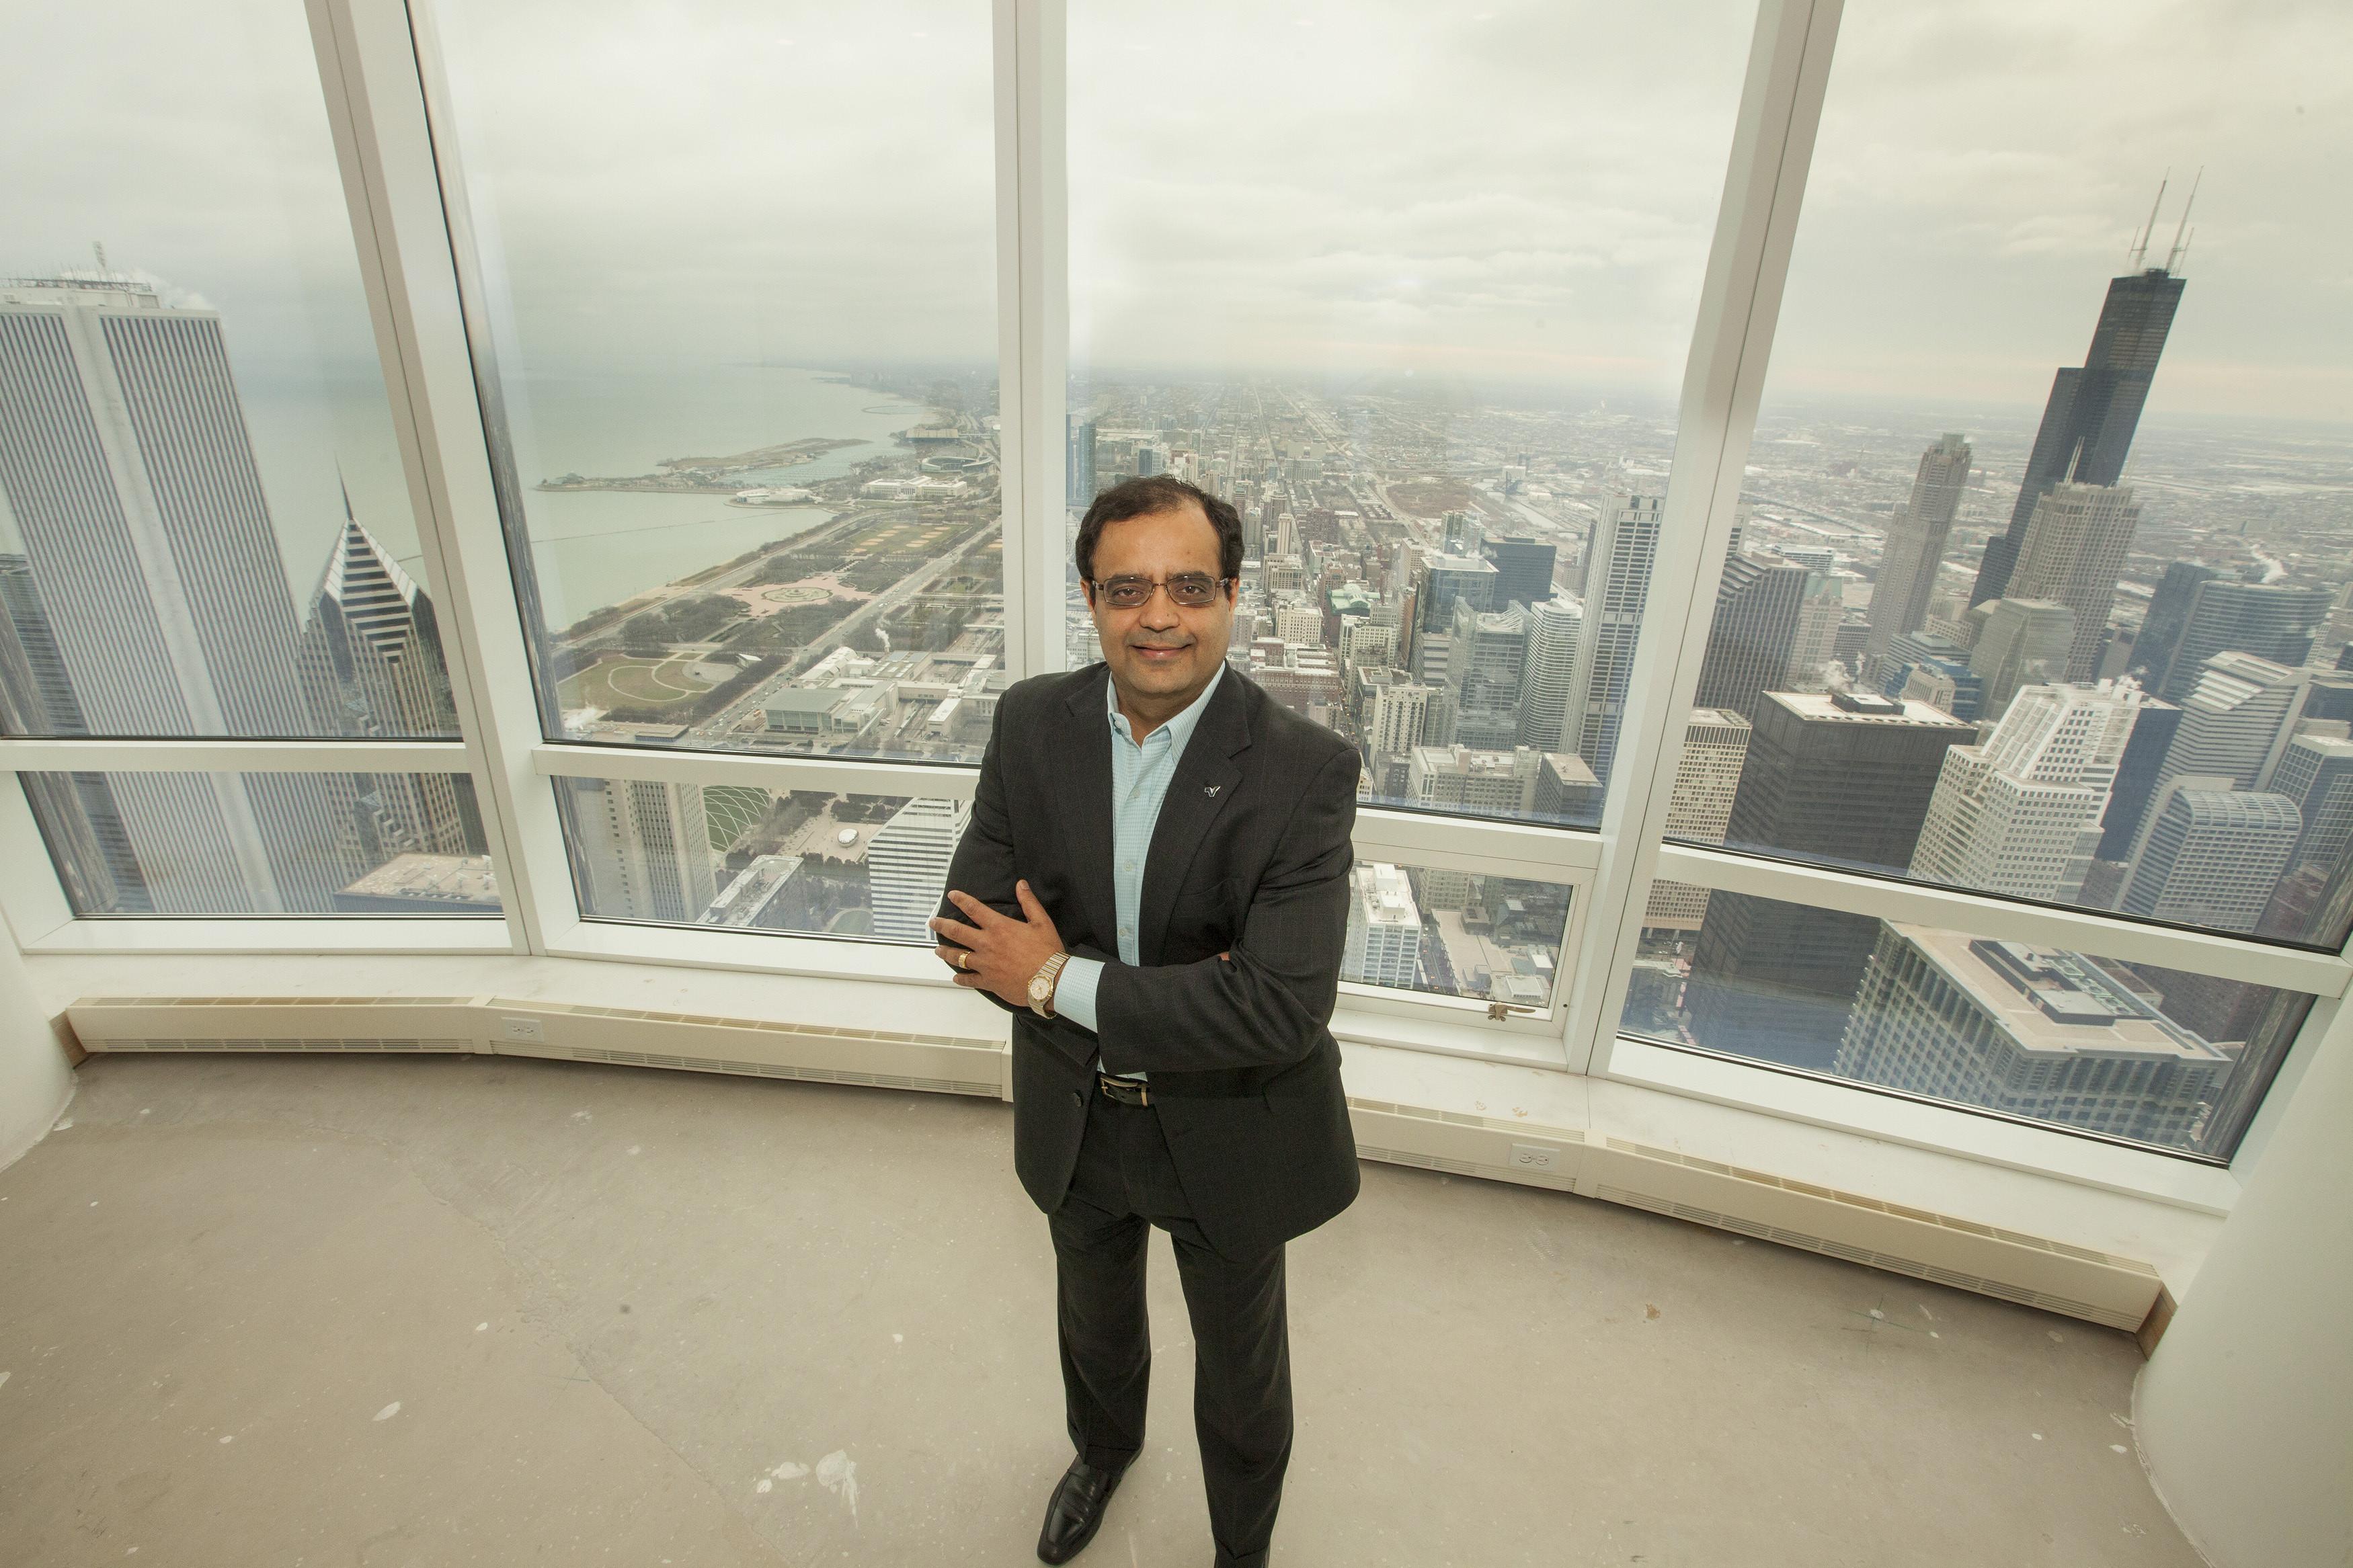 sanjay shah chicago